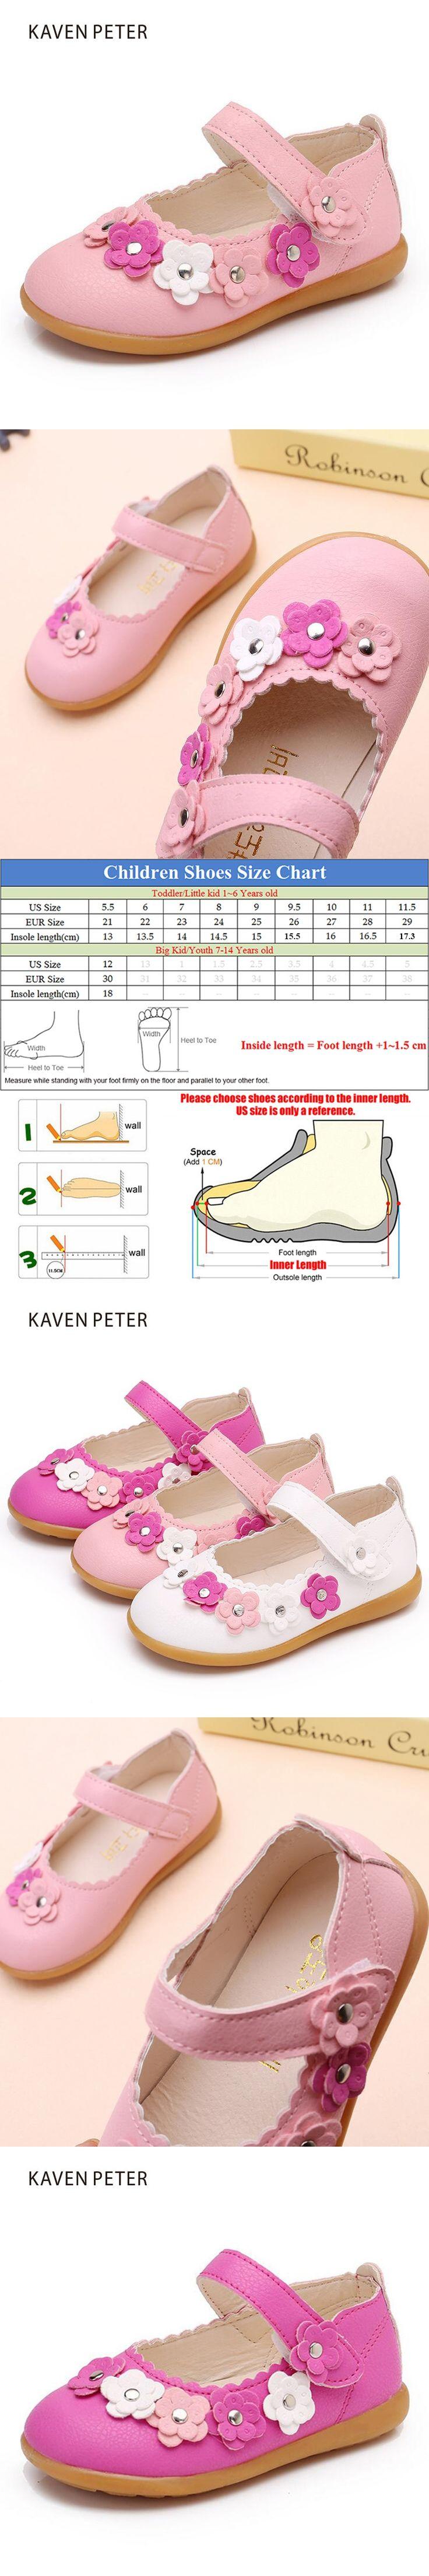 89 best Children s Shoes images on Pinterest